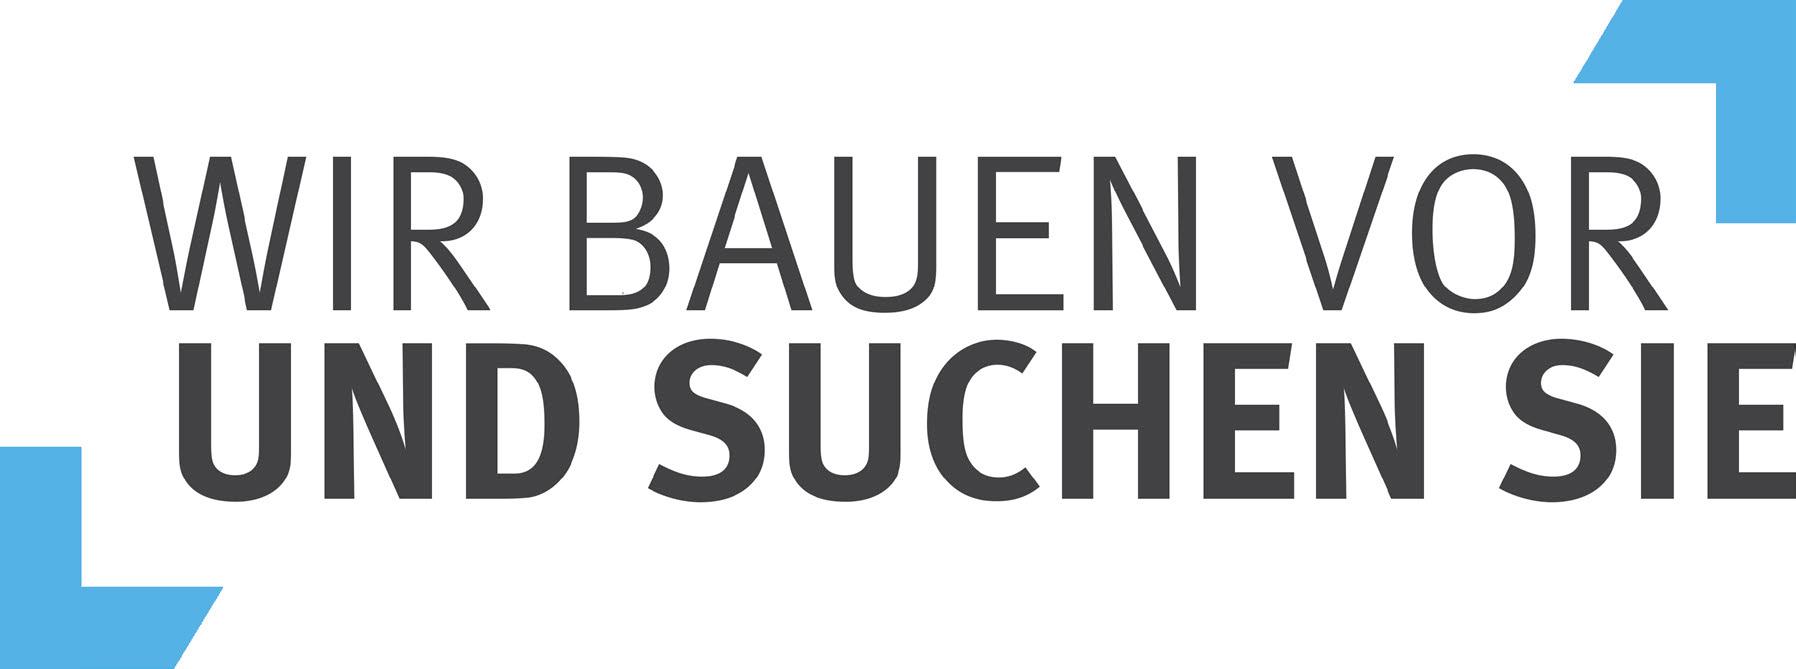 salzburg-image